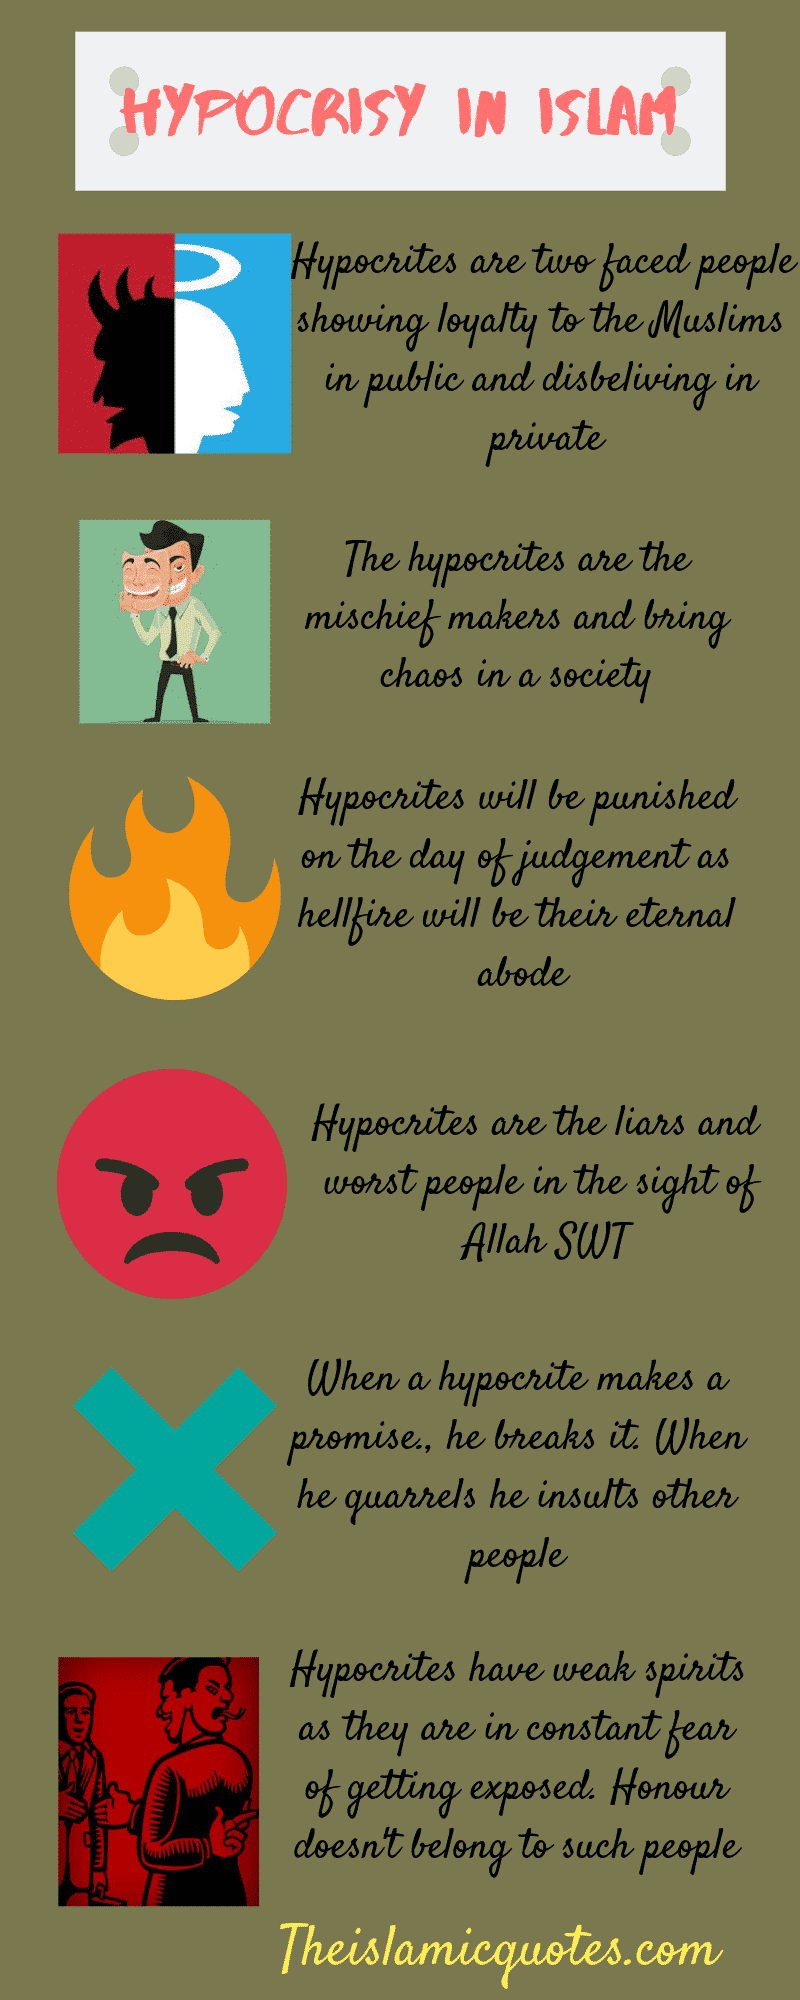 Hypocrisy in Islam quotes (3)